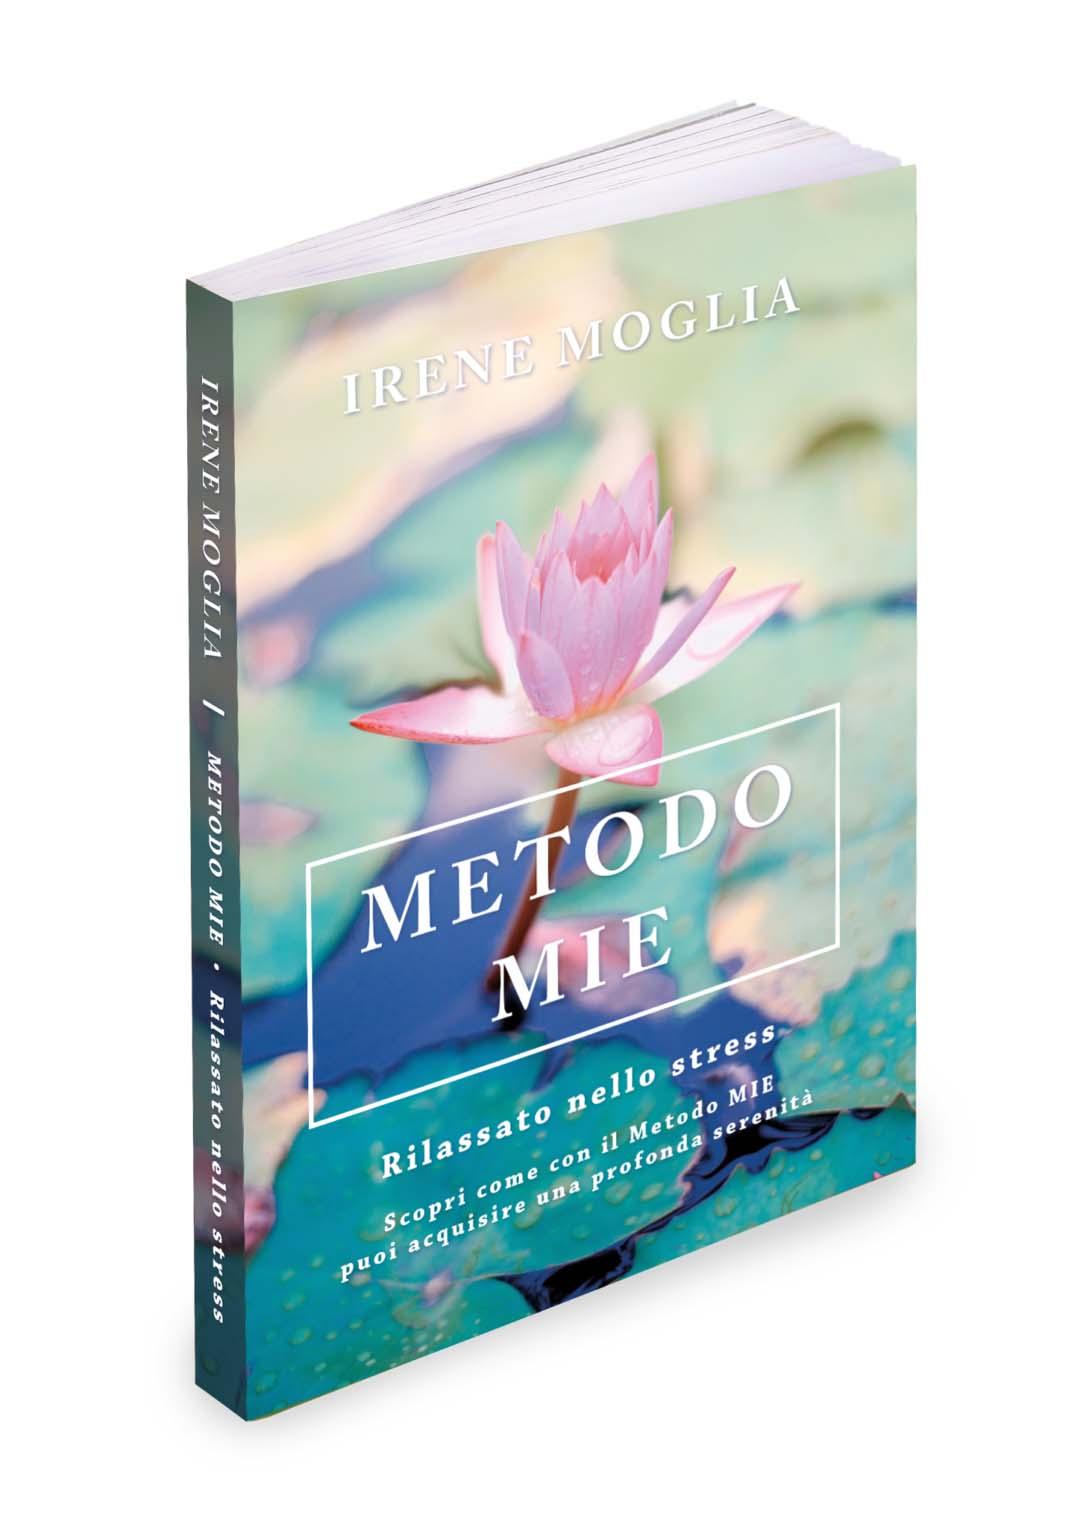 Metodo Mie libro